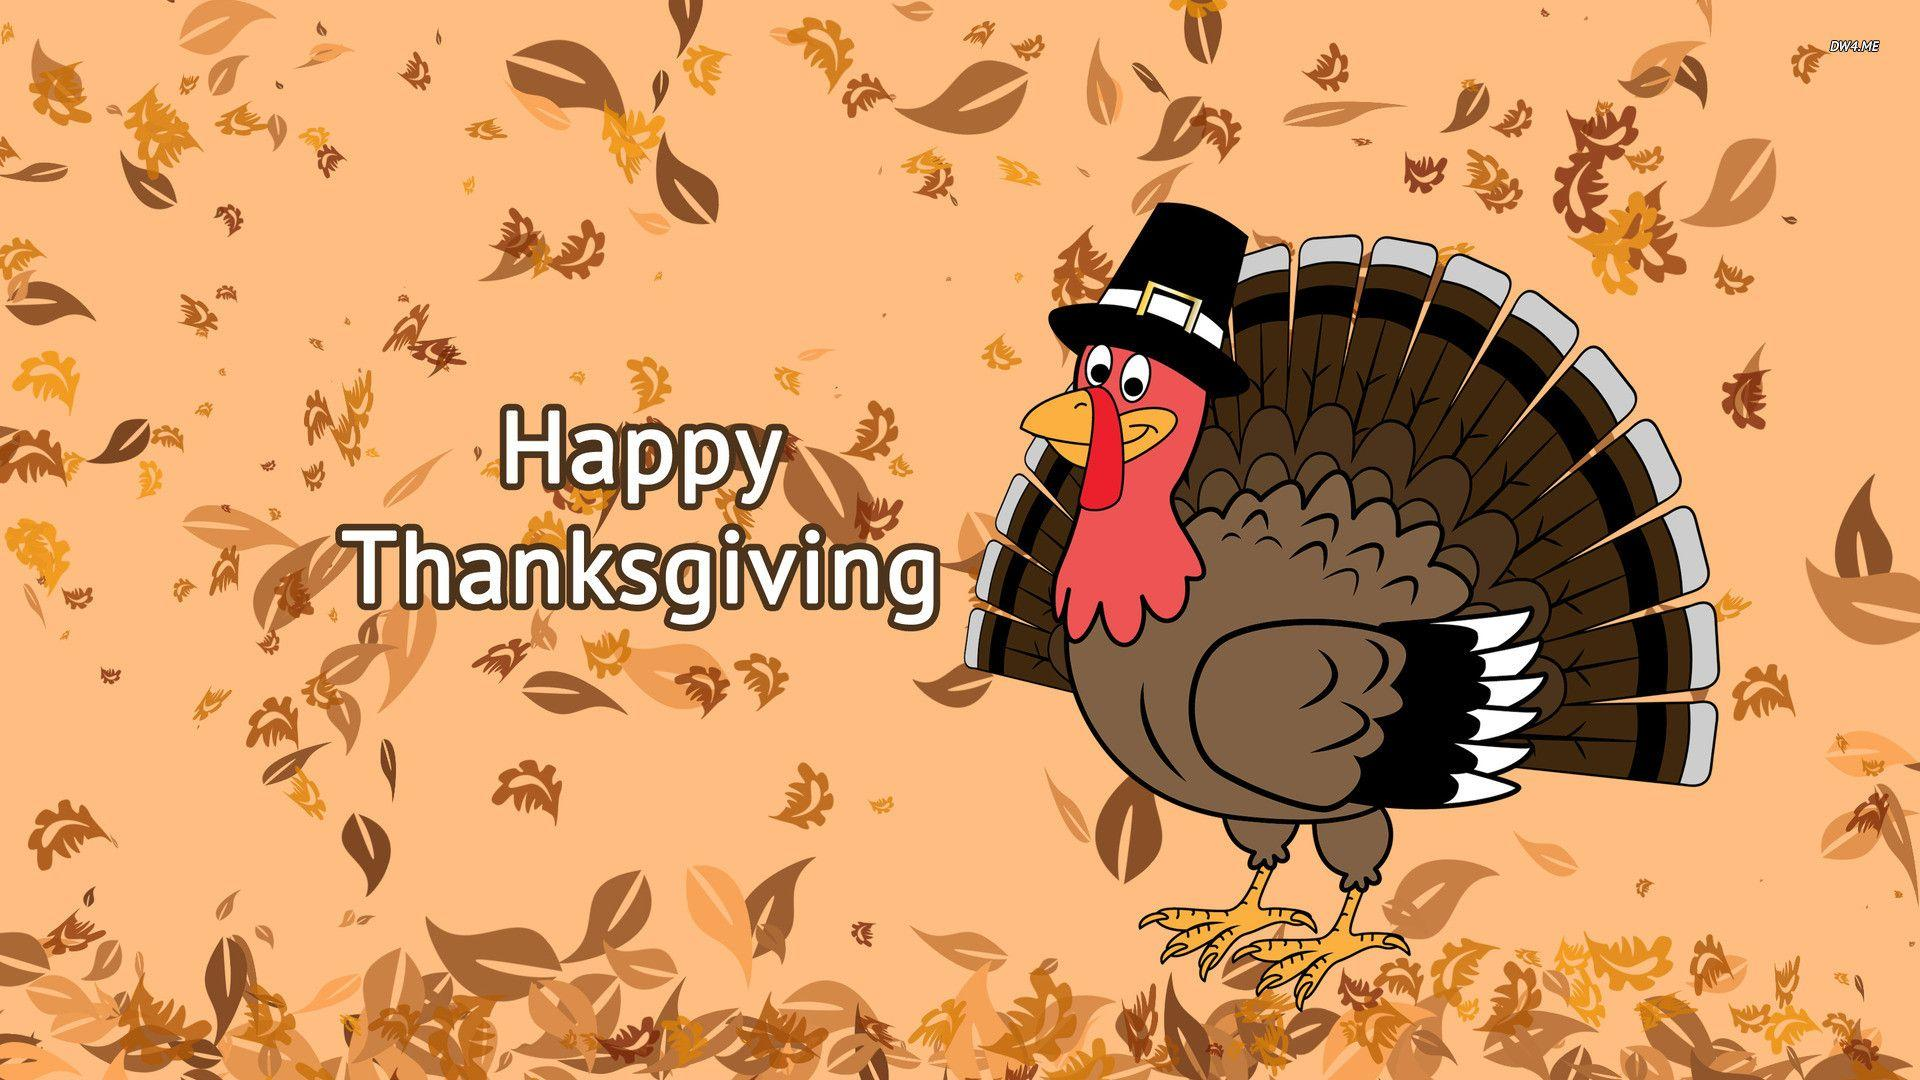 Happy Thanksgiving Desktop Wallpapers - Wallpaper Cave